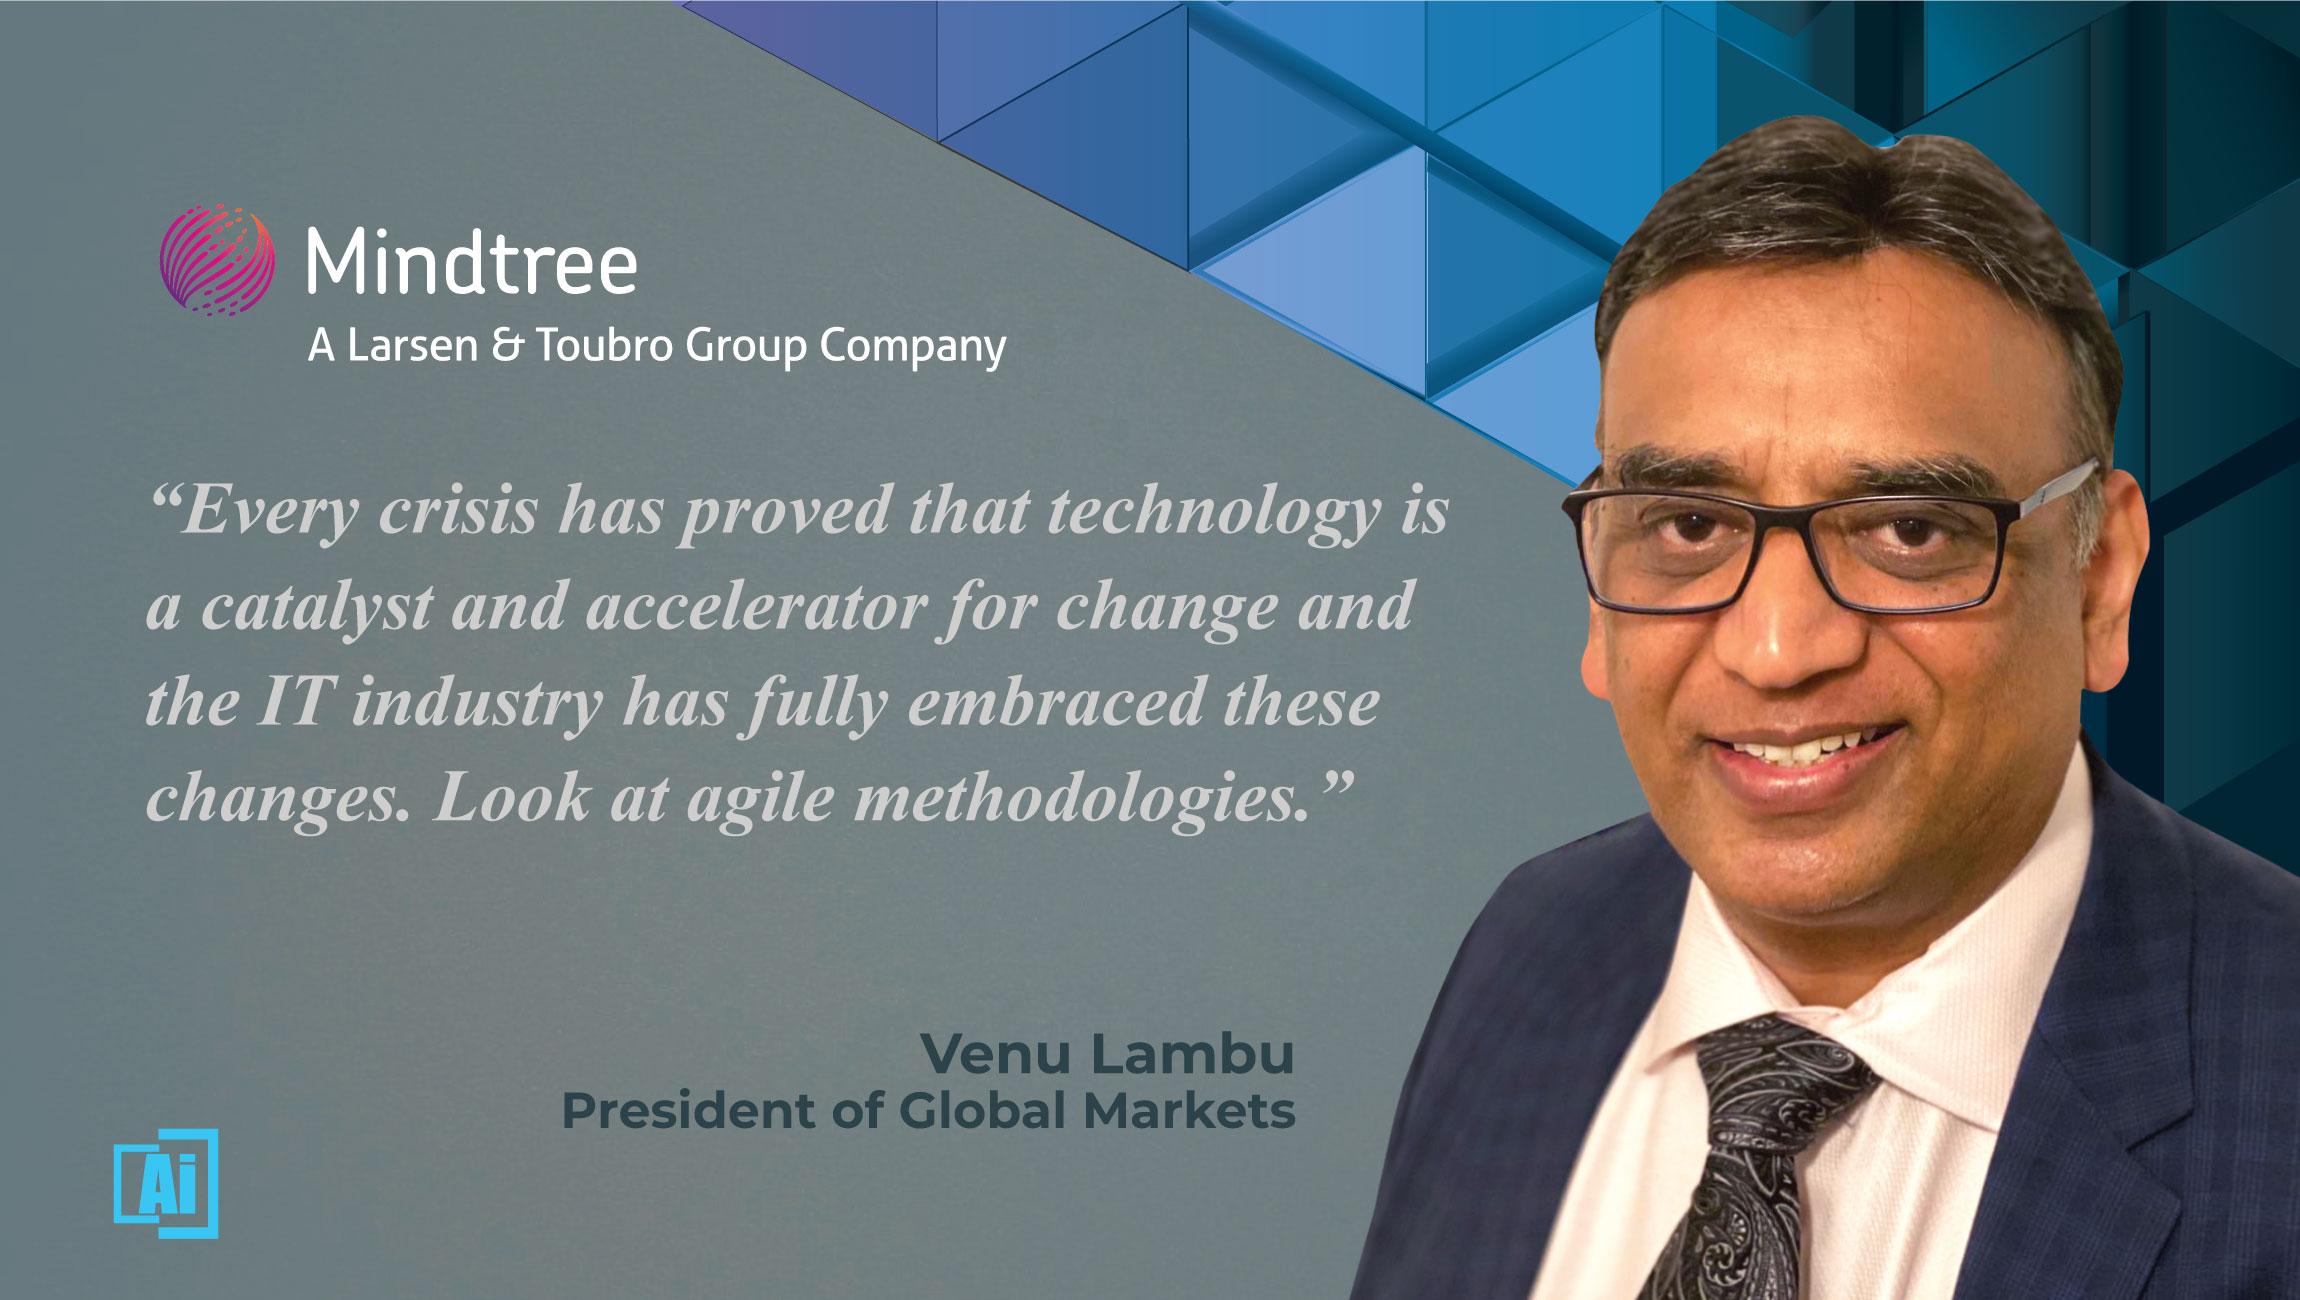 AiThority Interview With Venu Lambu, President Of Global Markets – MindTree